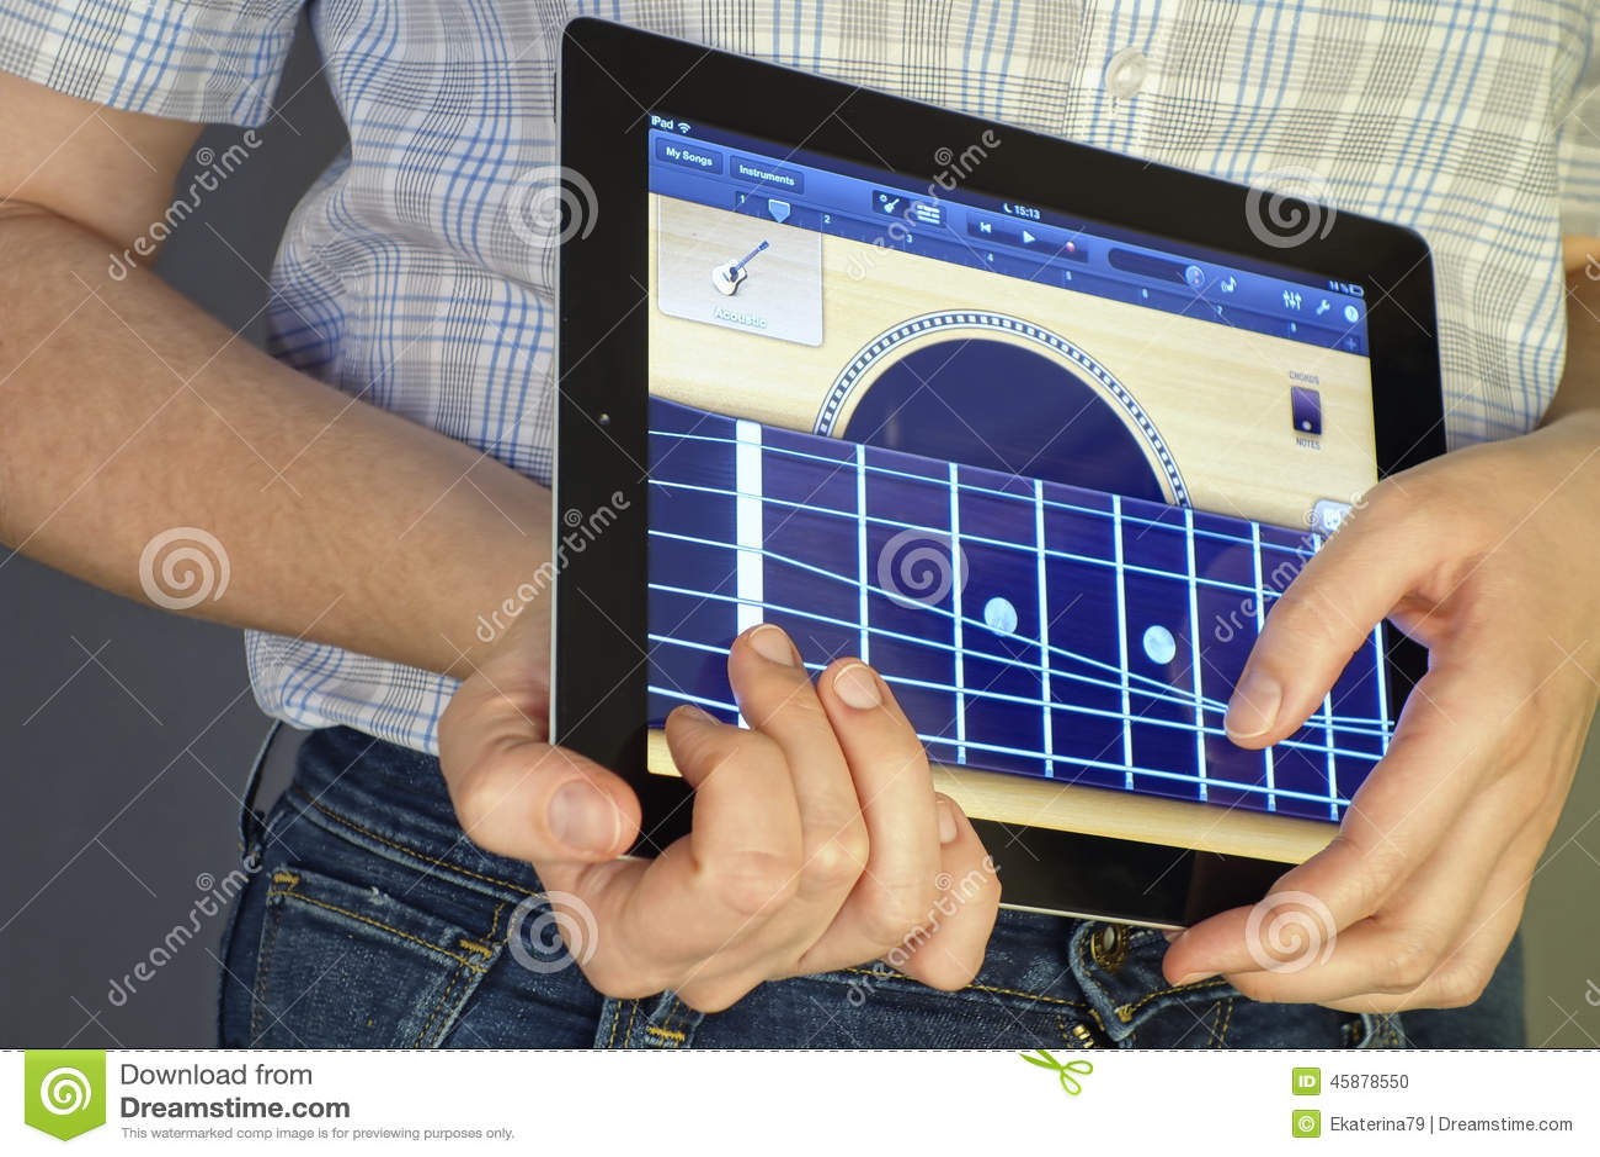 Playing guitar on Ipad editorial image  Image of garage - 45878550